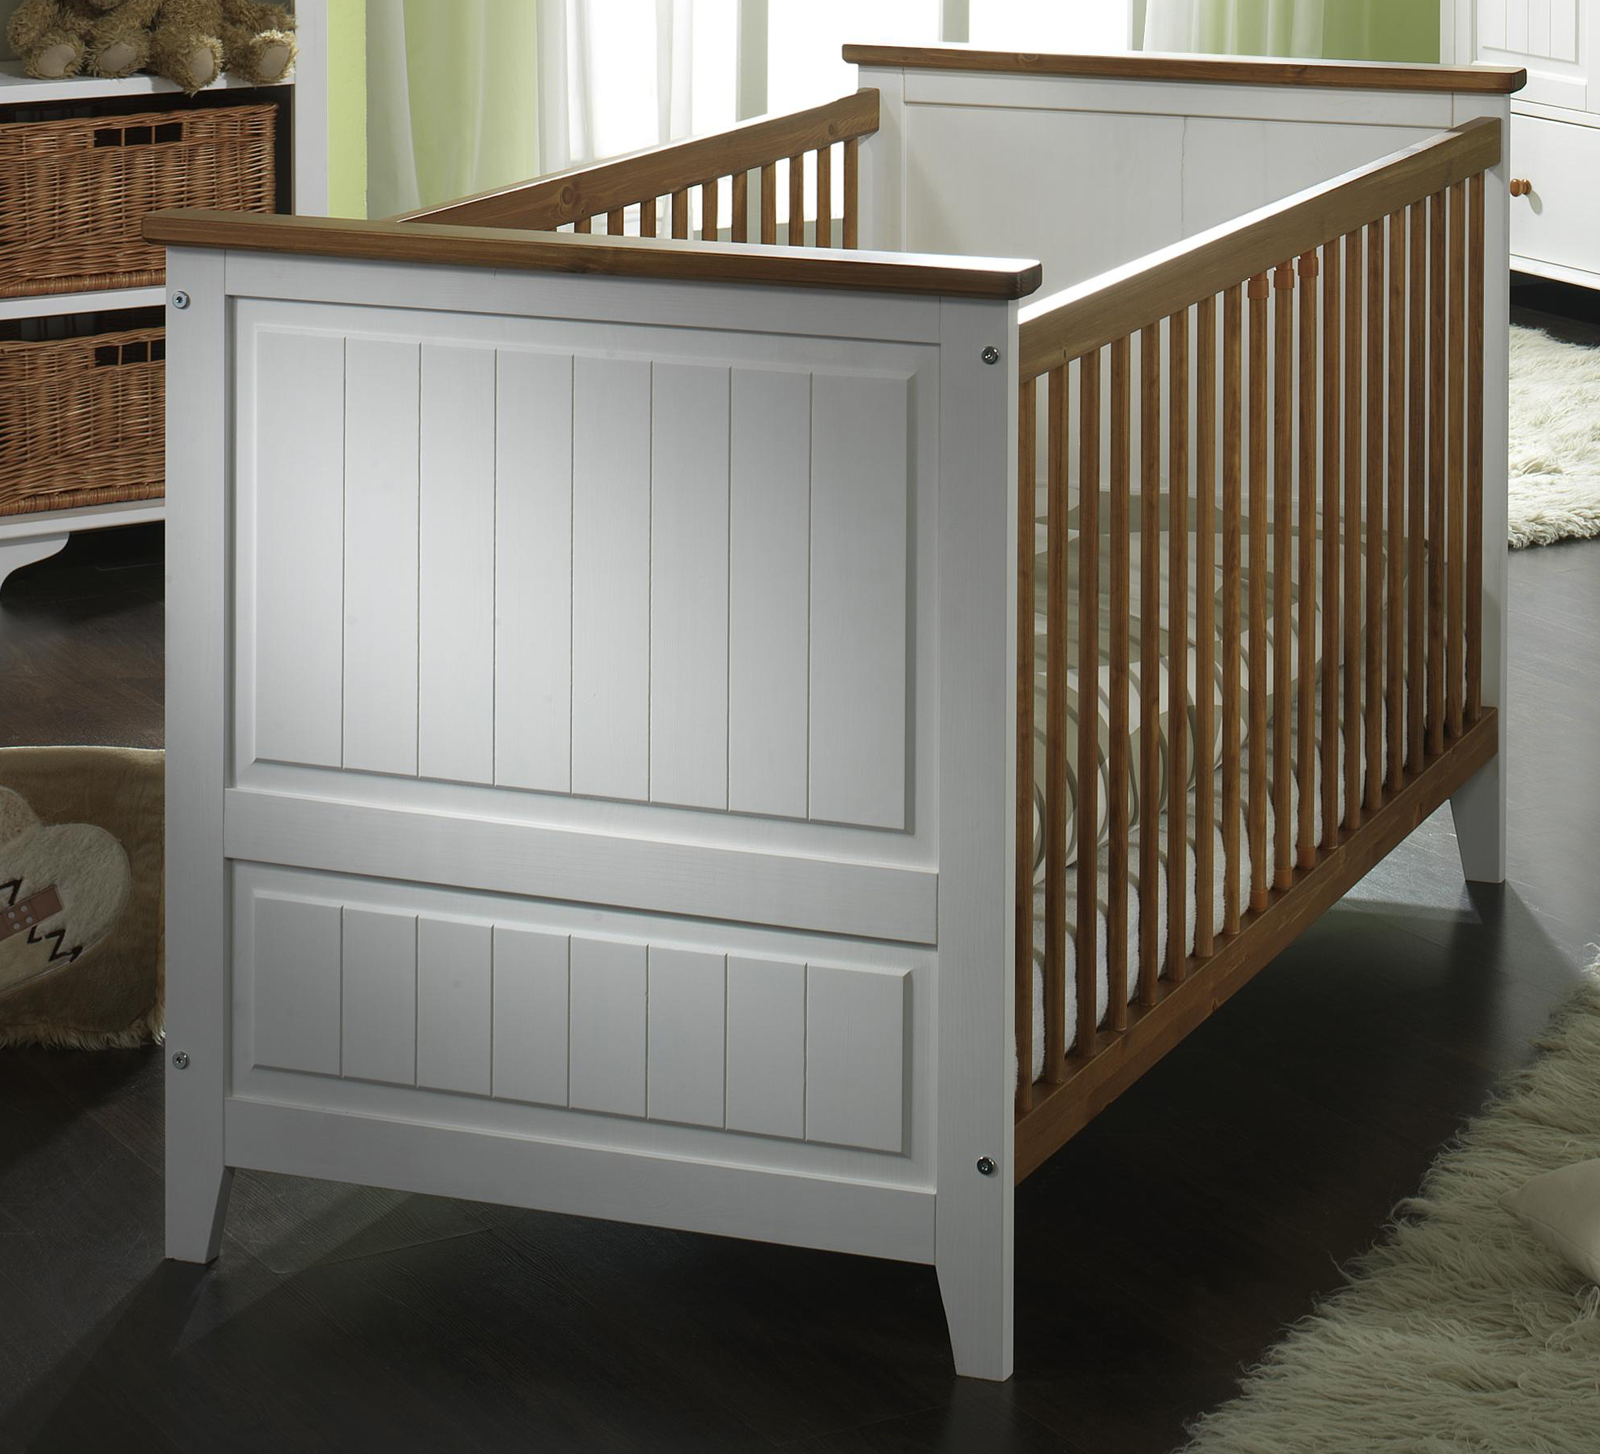 sam babybett in wei kiefer massiv 70 x 140 cm julia. Black Bedroom Furniture Sets. Home Design Ideas